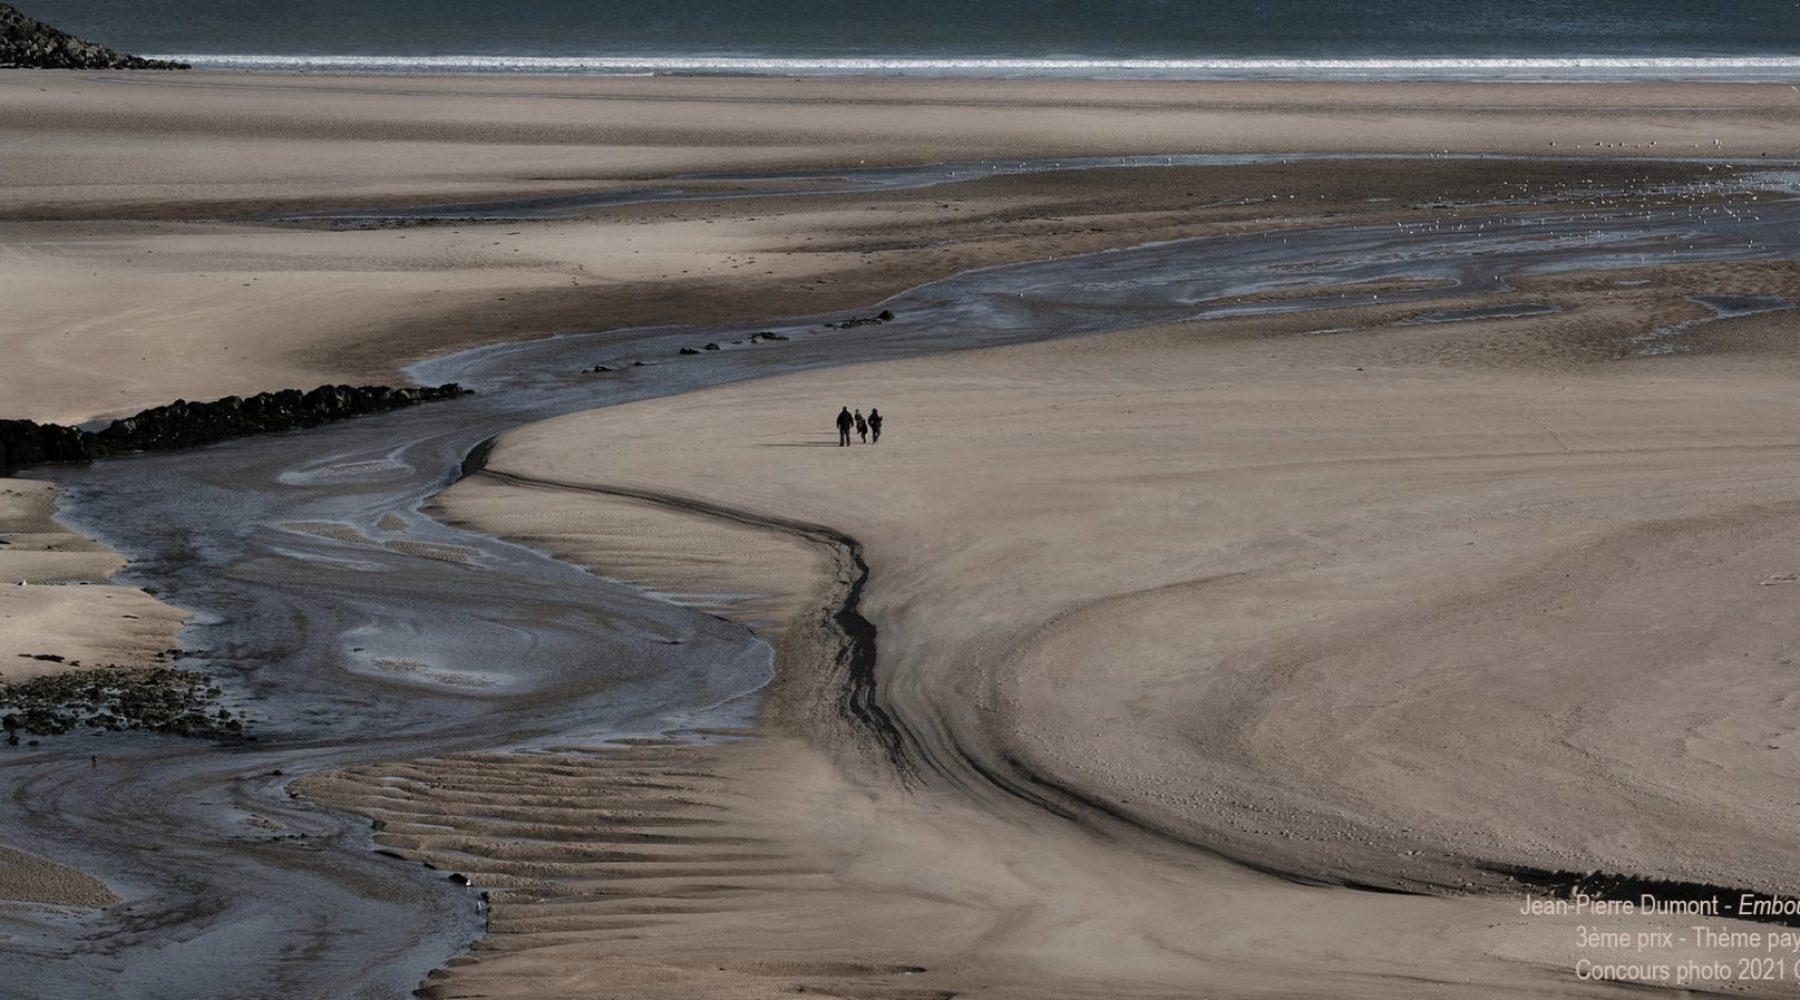 Embouchure de l'Islet – ©Jean-Pierre Dumont